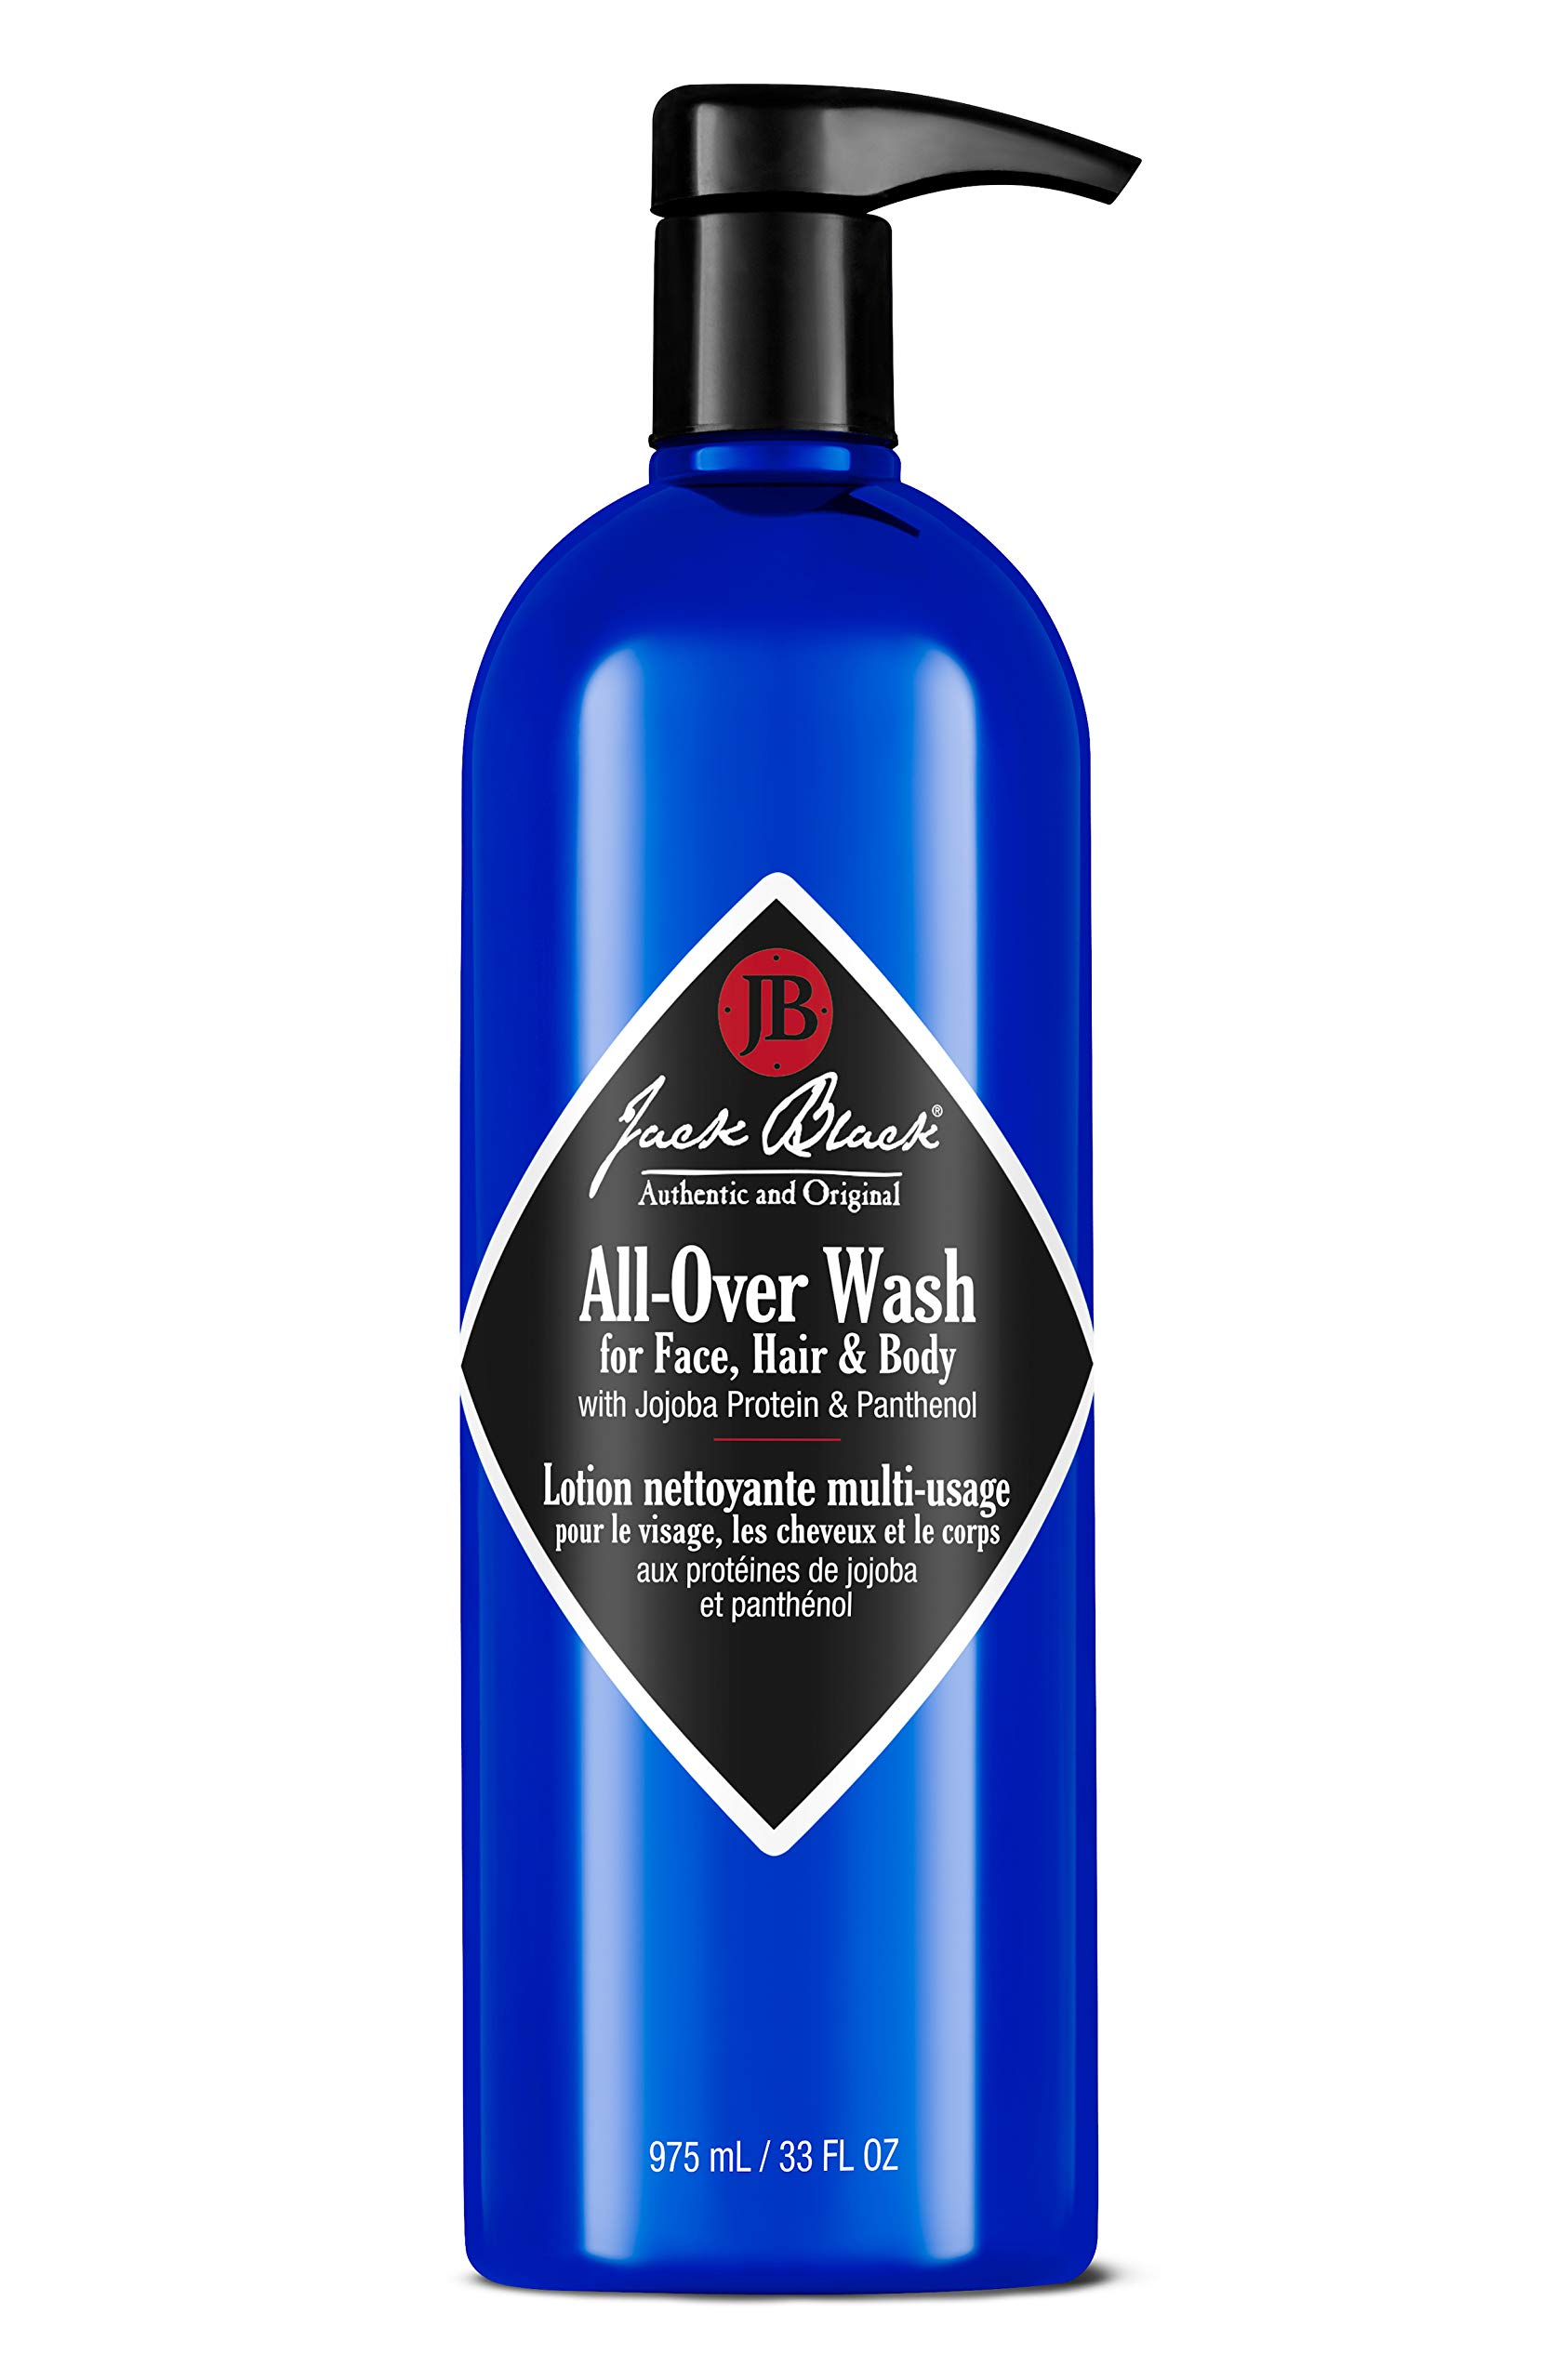 Jack Black All-Over Wash For Face, Hair & Body, 33 fl. oz. by Jack Black